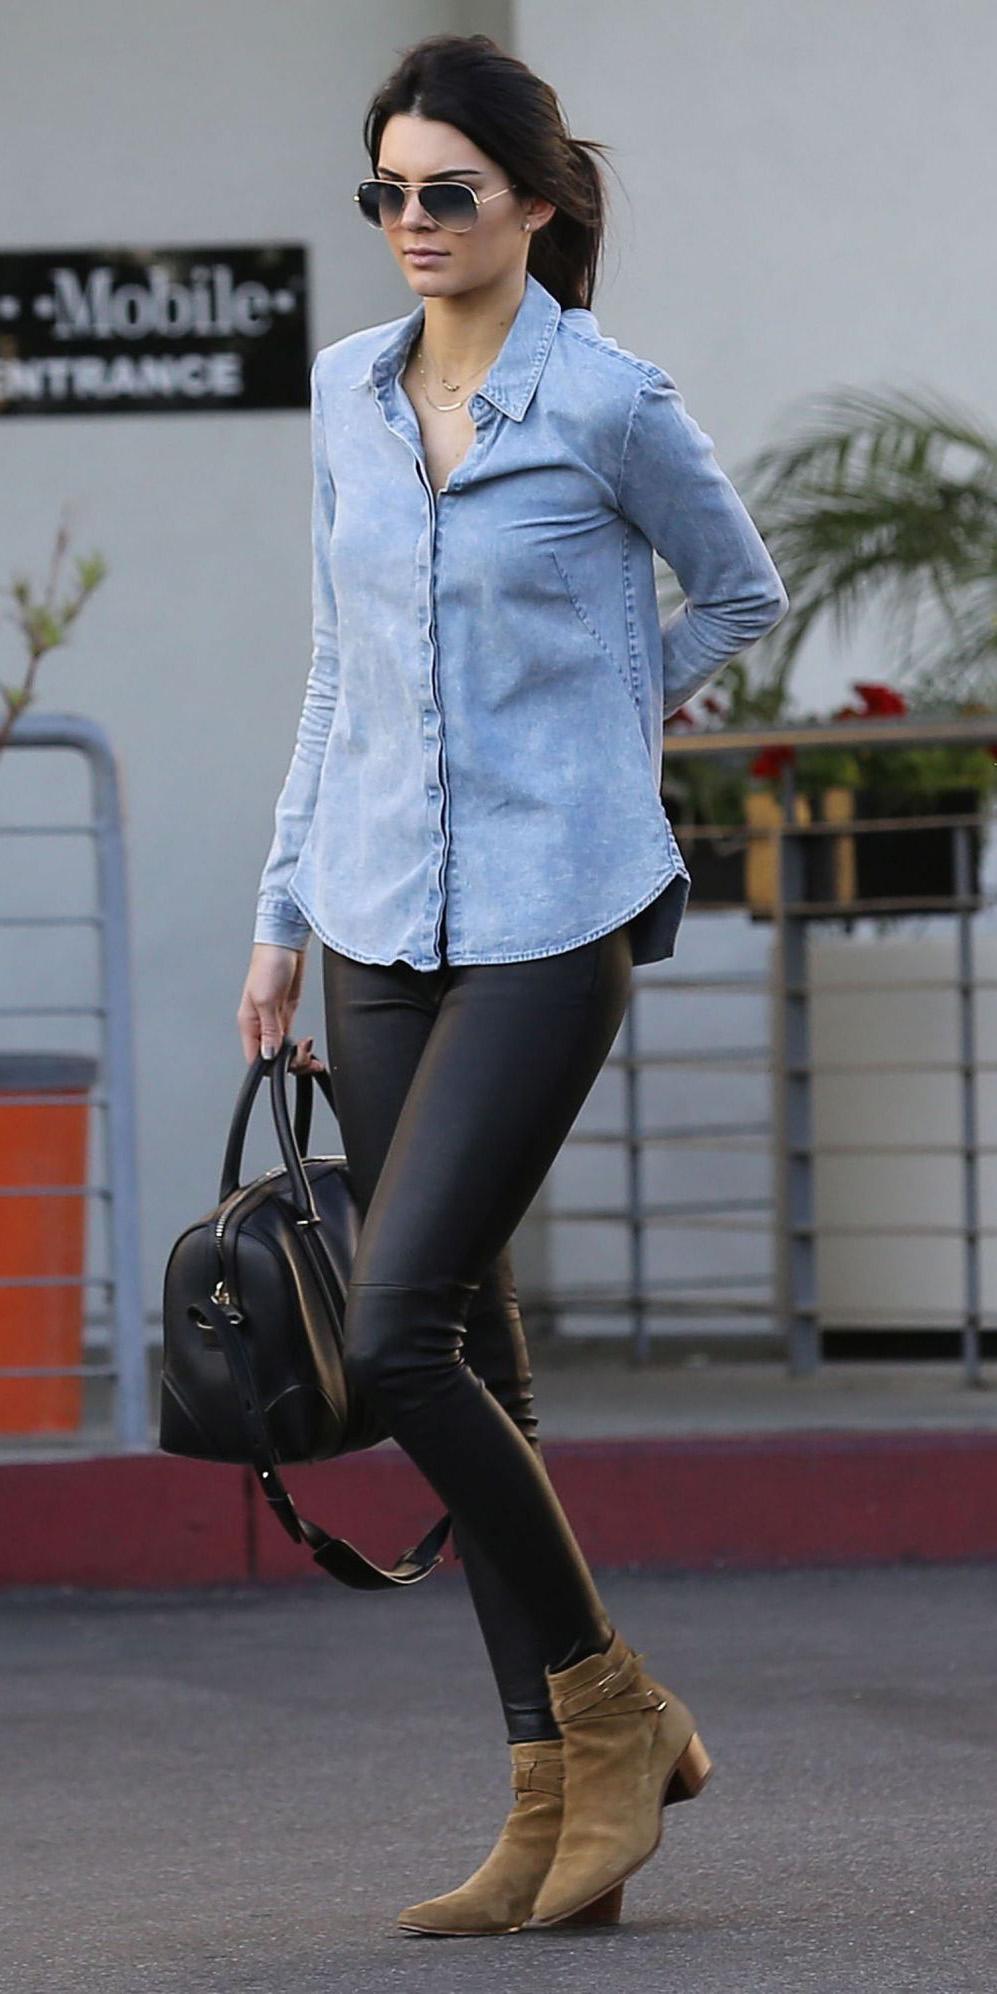 black-leggings-blue-light-collared-shirt-sun-pony-black-bag-tan-shoe-booties-wear-style-fashion-spring-summer-chambray-kendalljenner-celebrity-brun-weekend.jpg